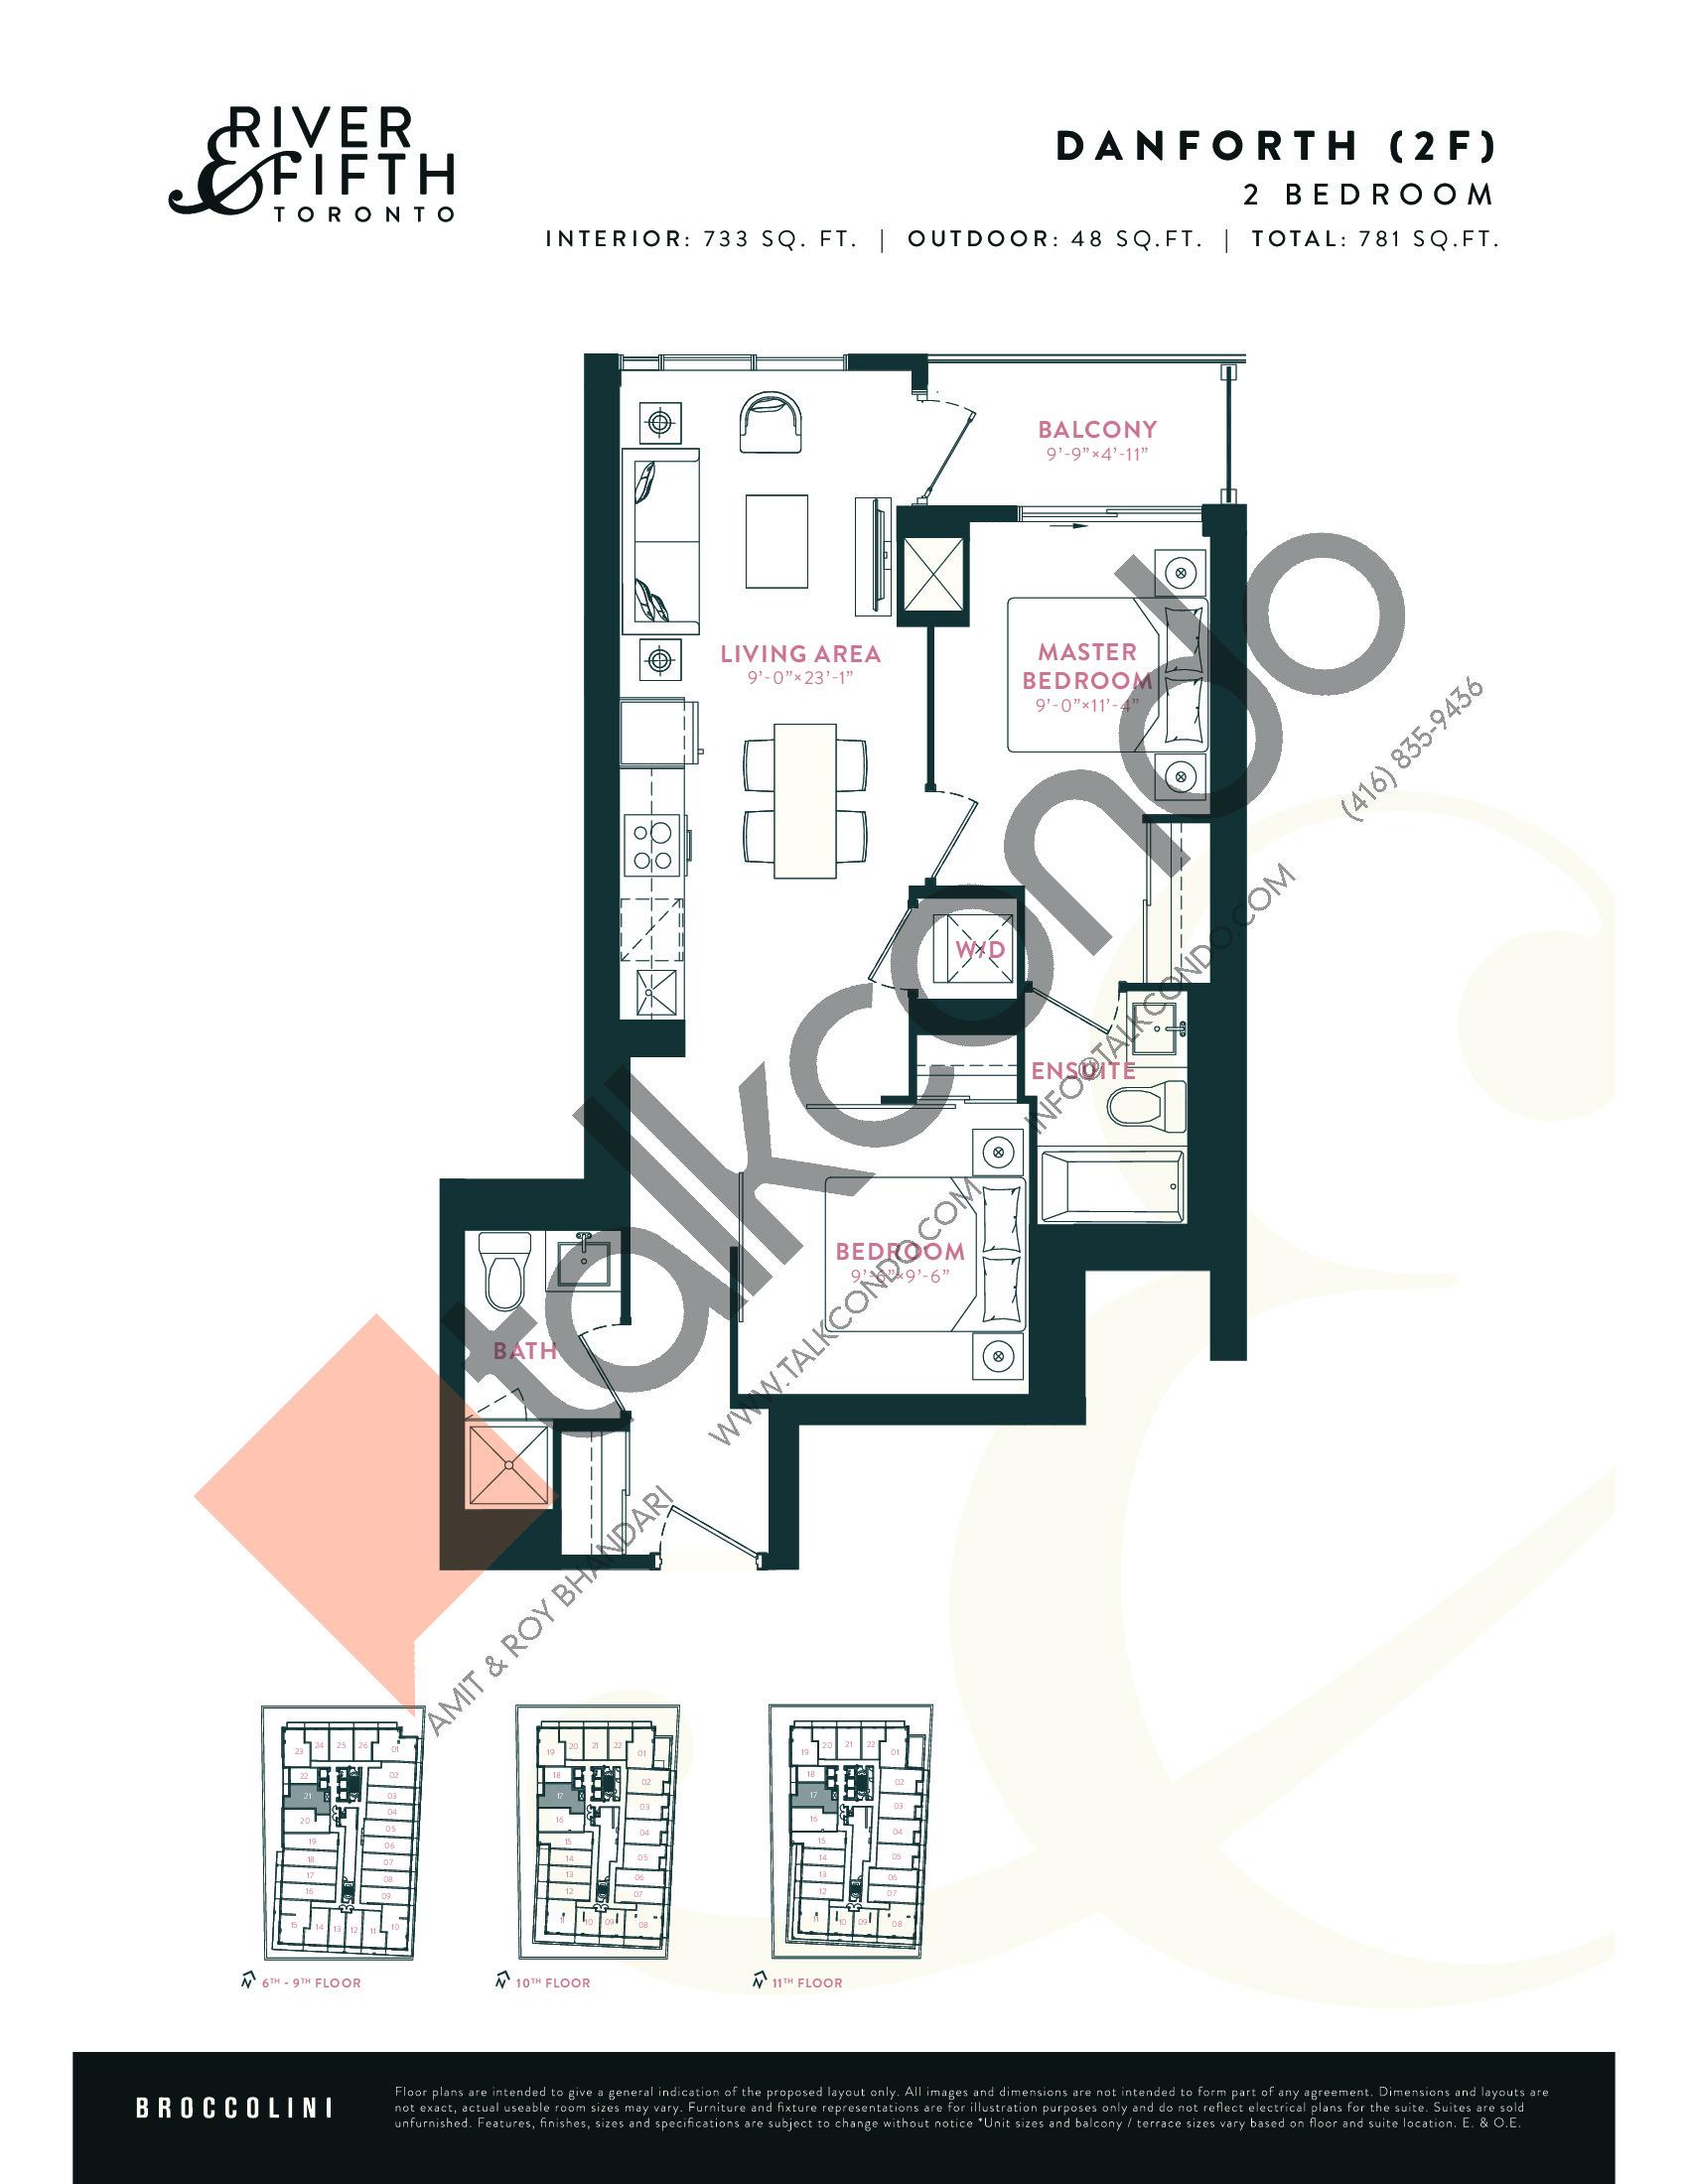 Danforth (2F) Floor Plan at River & Fifth Condos - 733 sq.ft